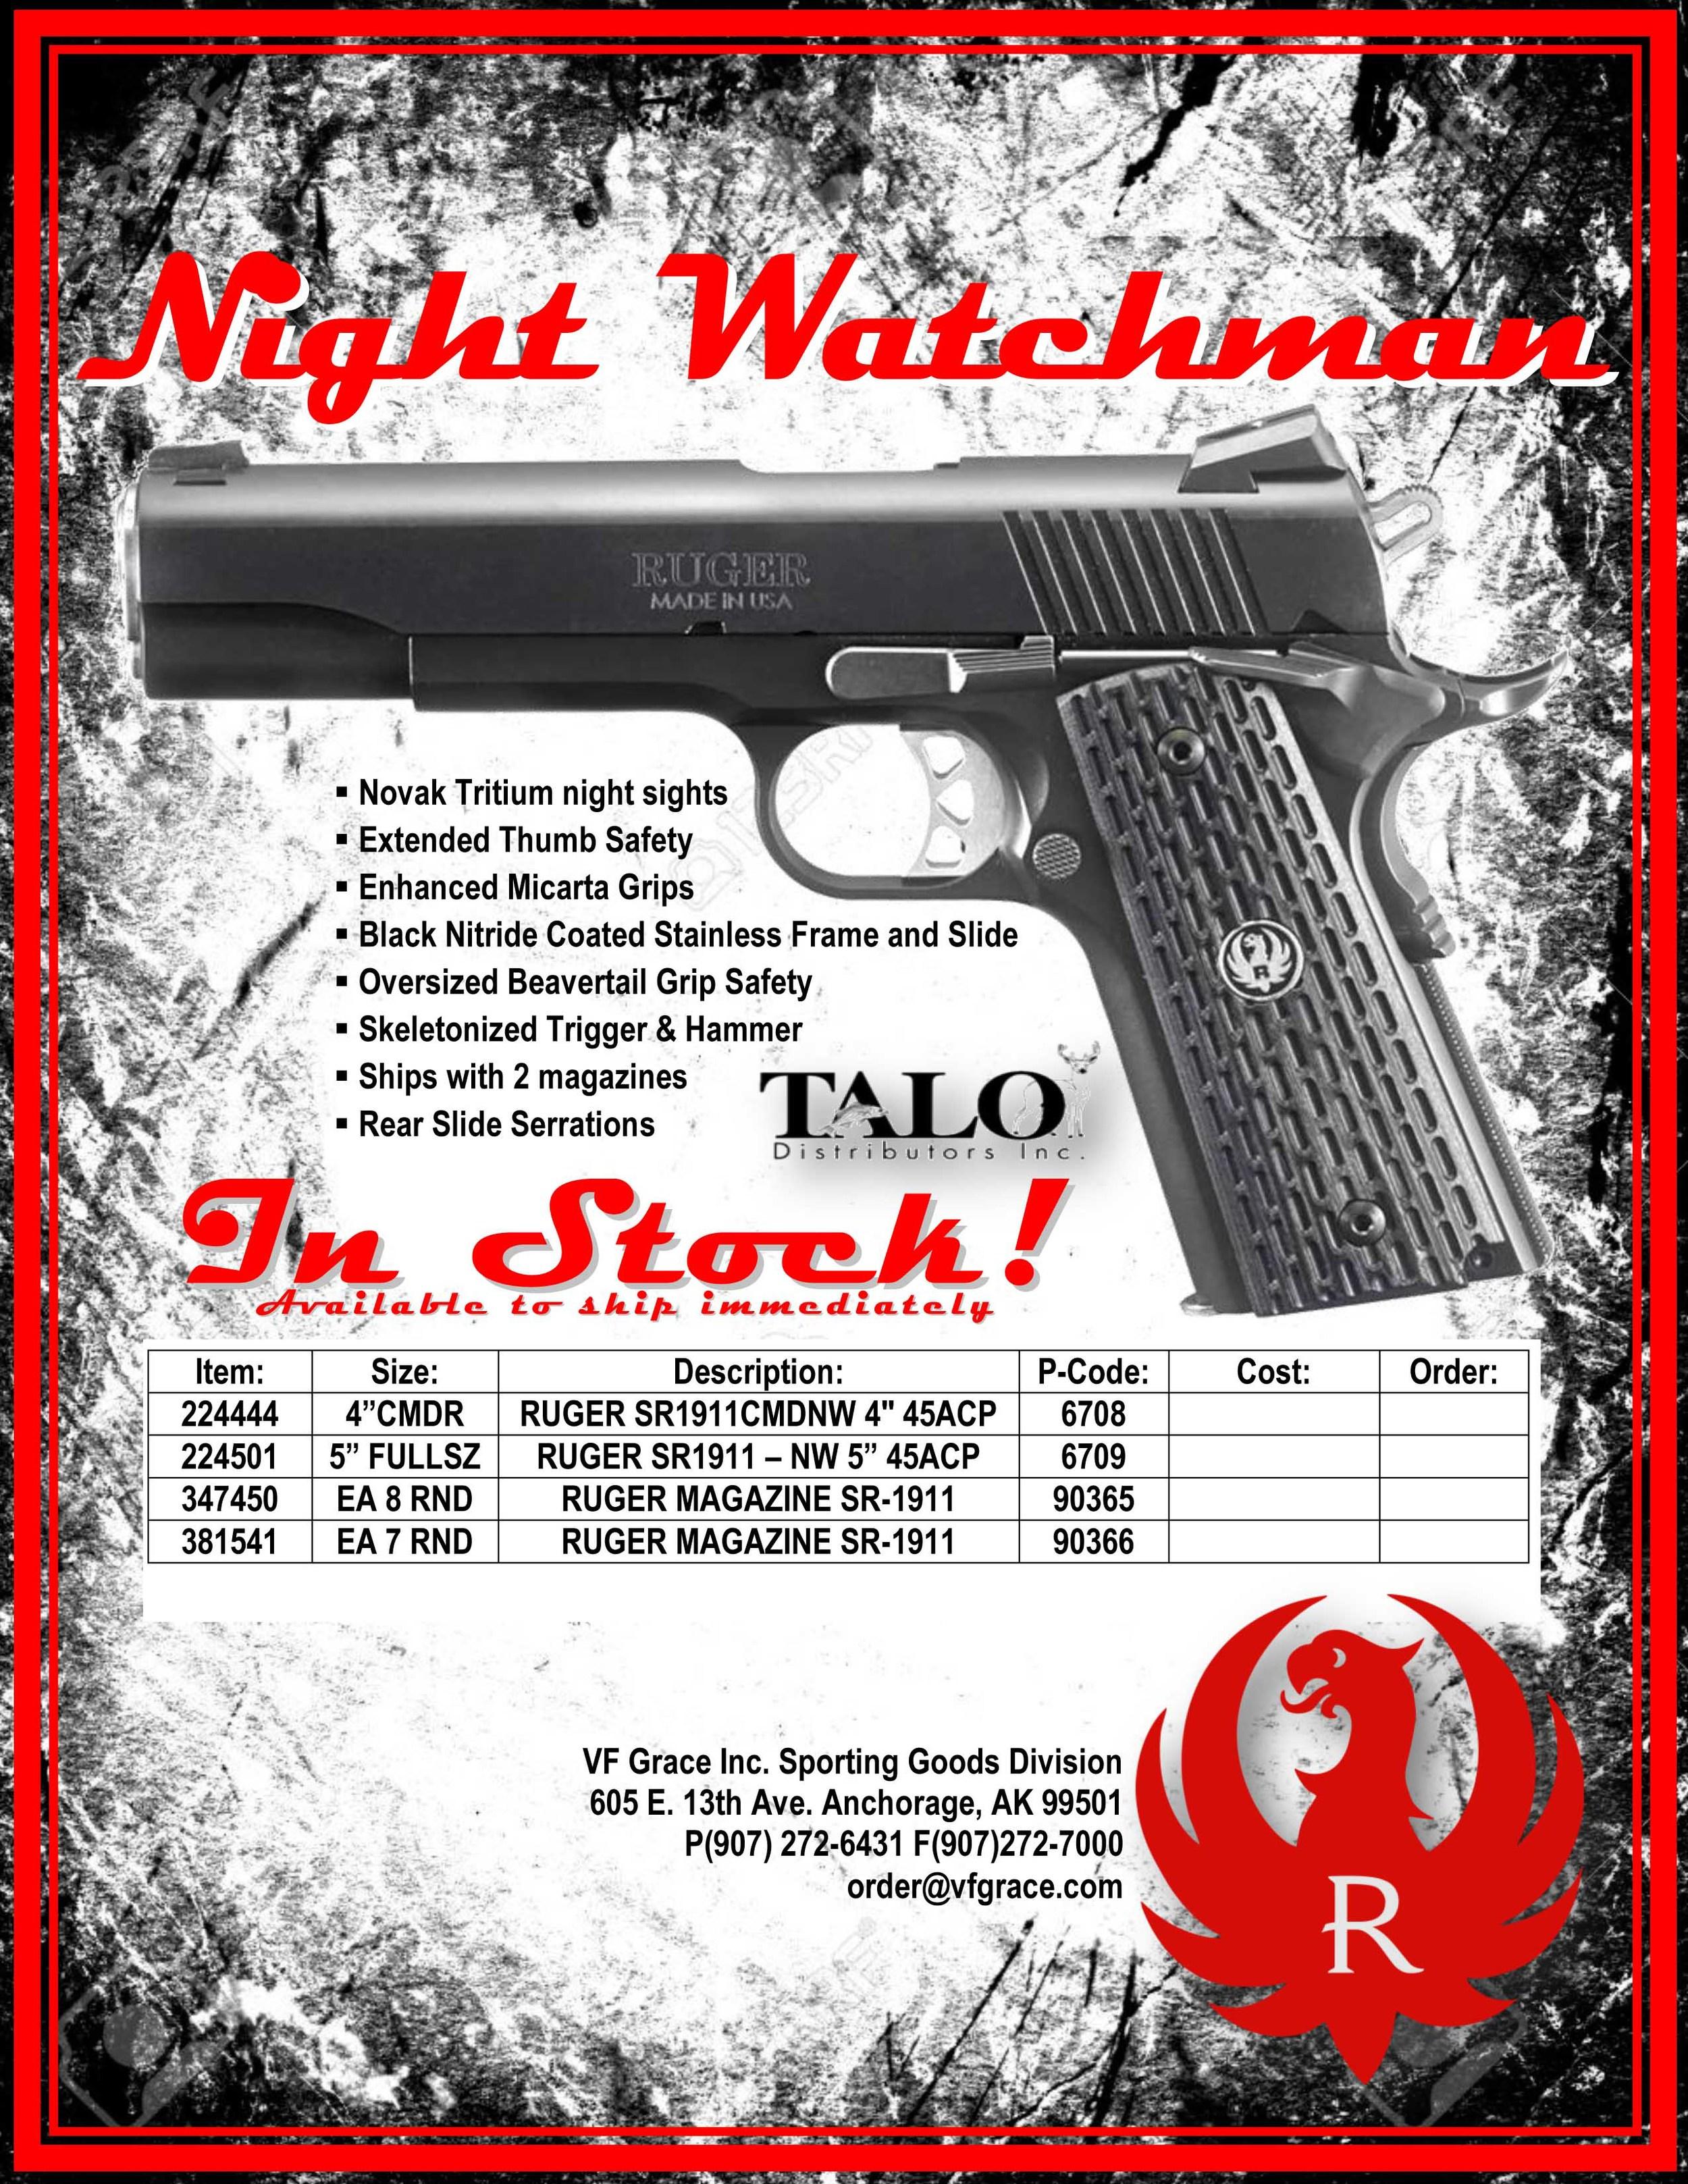 Night Watchman Ruger 1911 O6707 & 06708 — TALO Distributors Inc